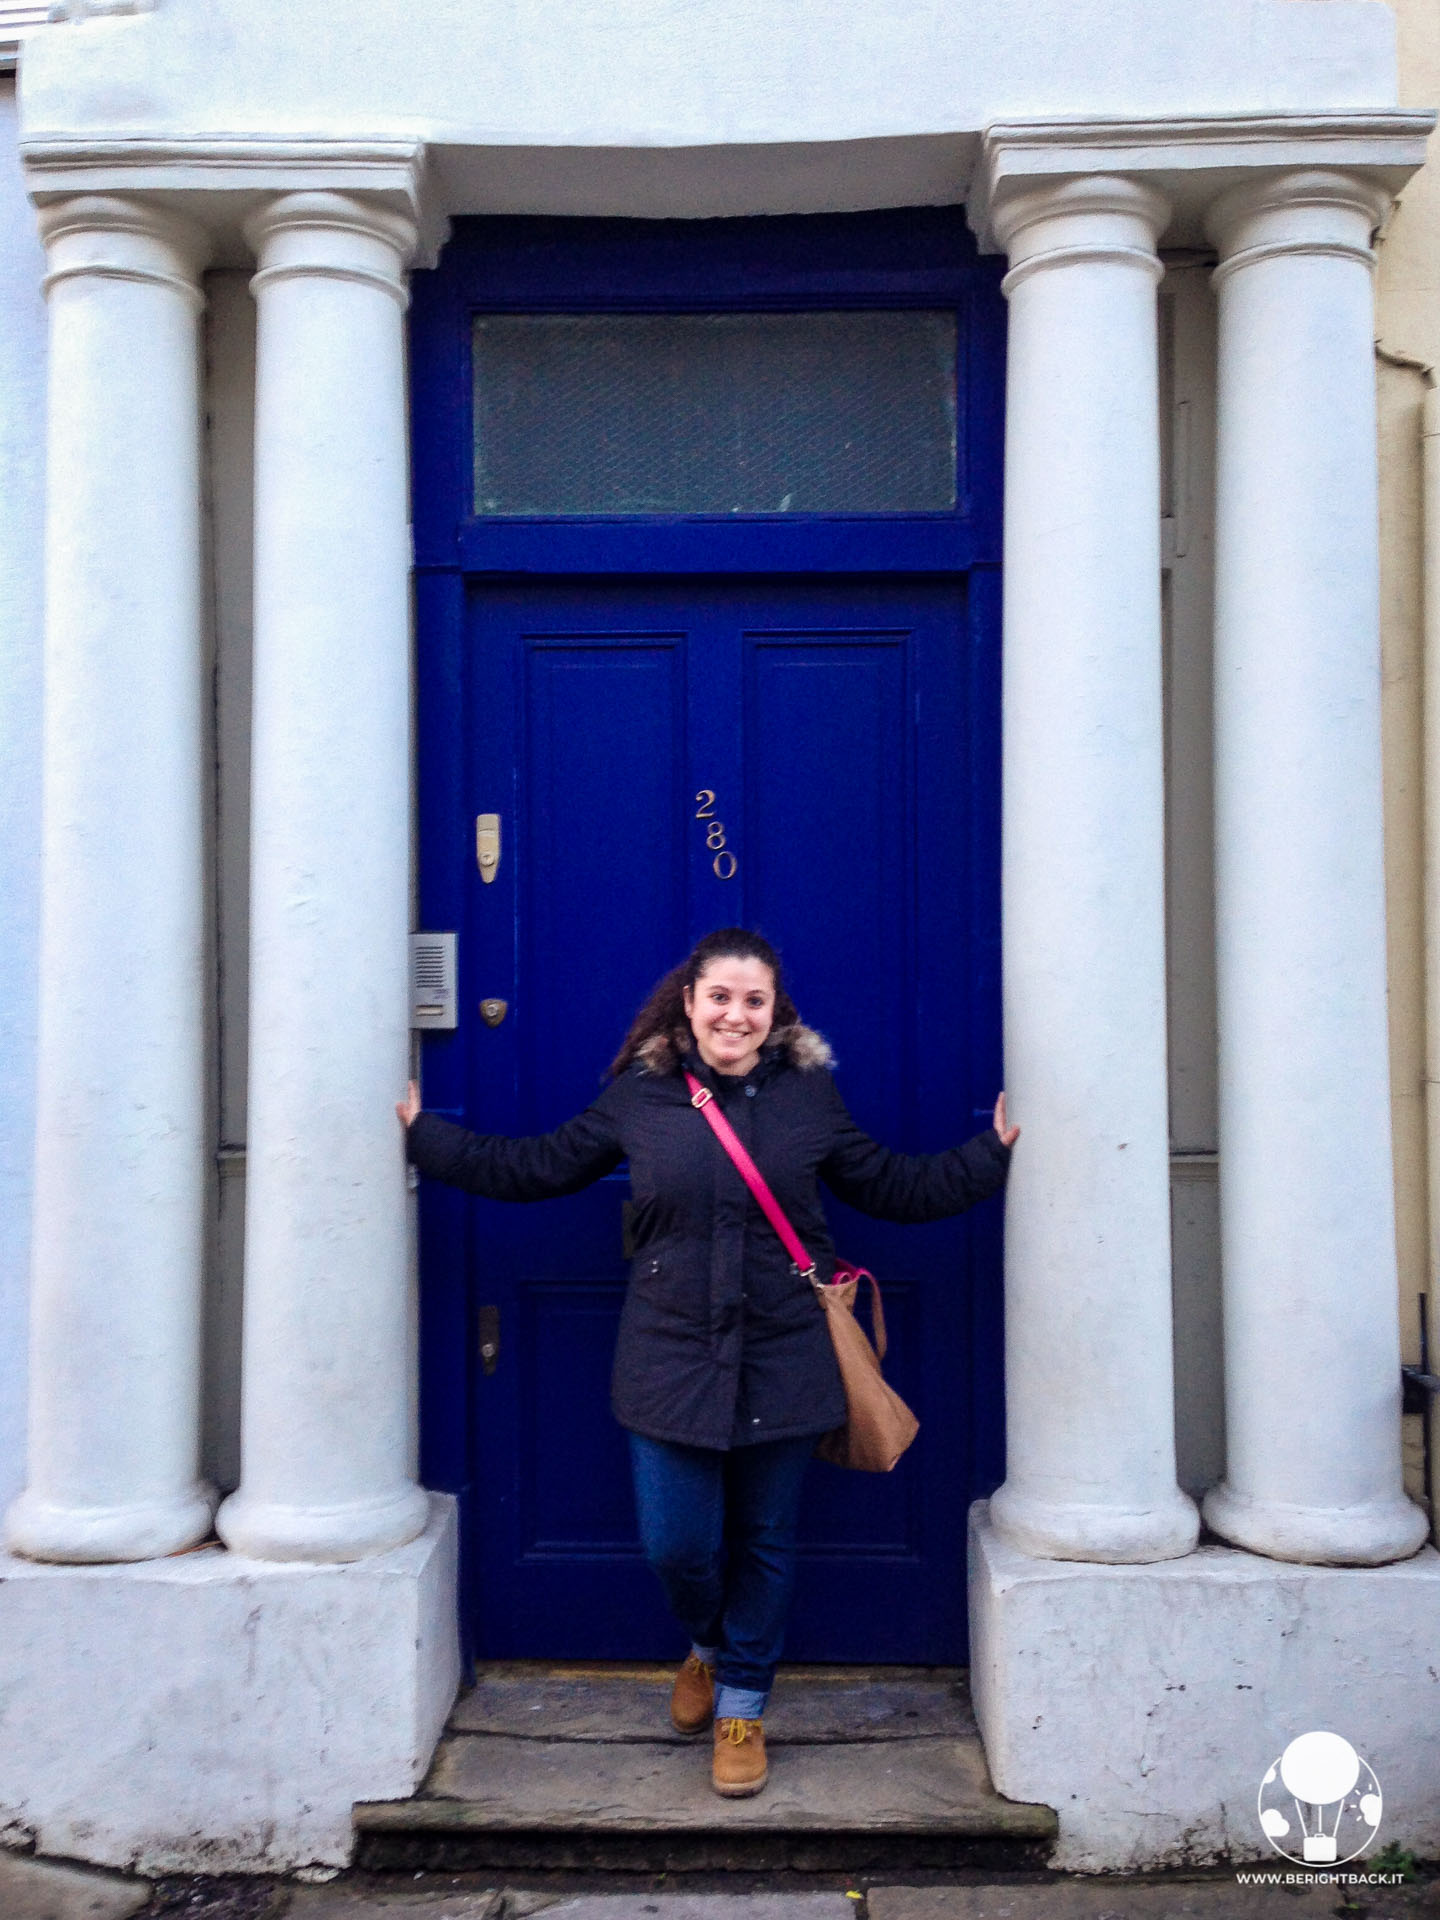 notting hill londra blue door appartamento william libraio hugh grant